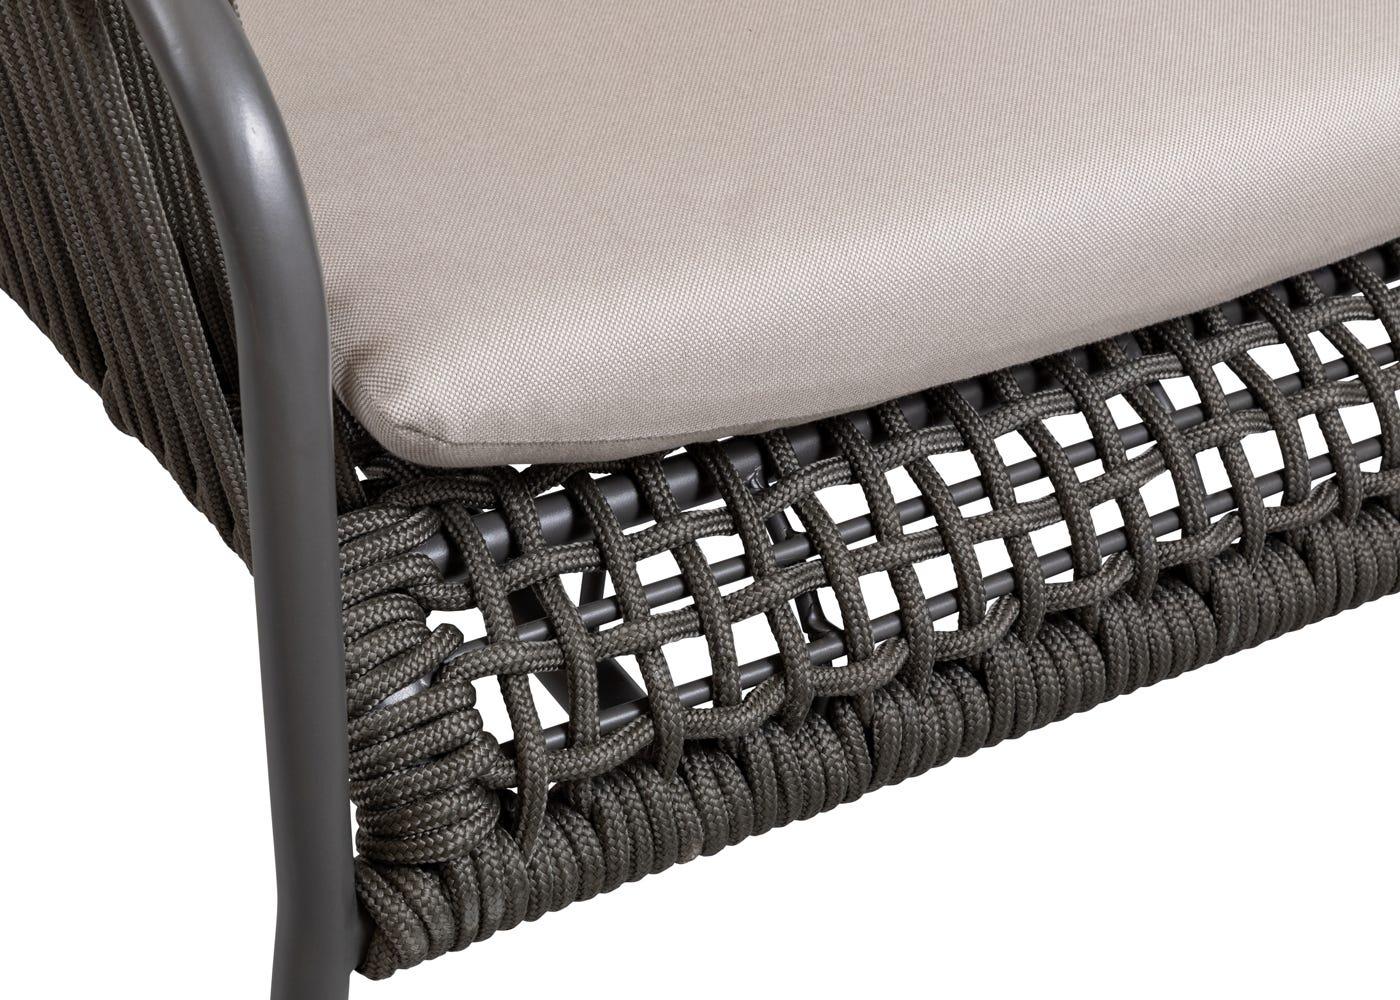 As shown: Padded cushion.